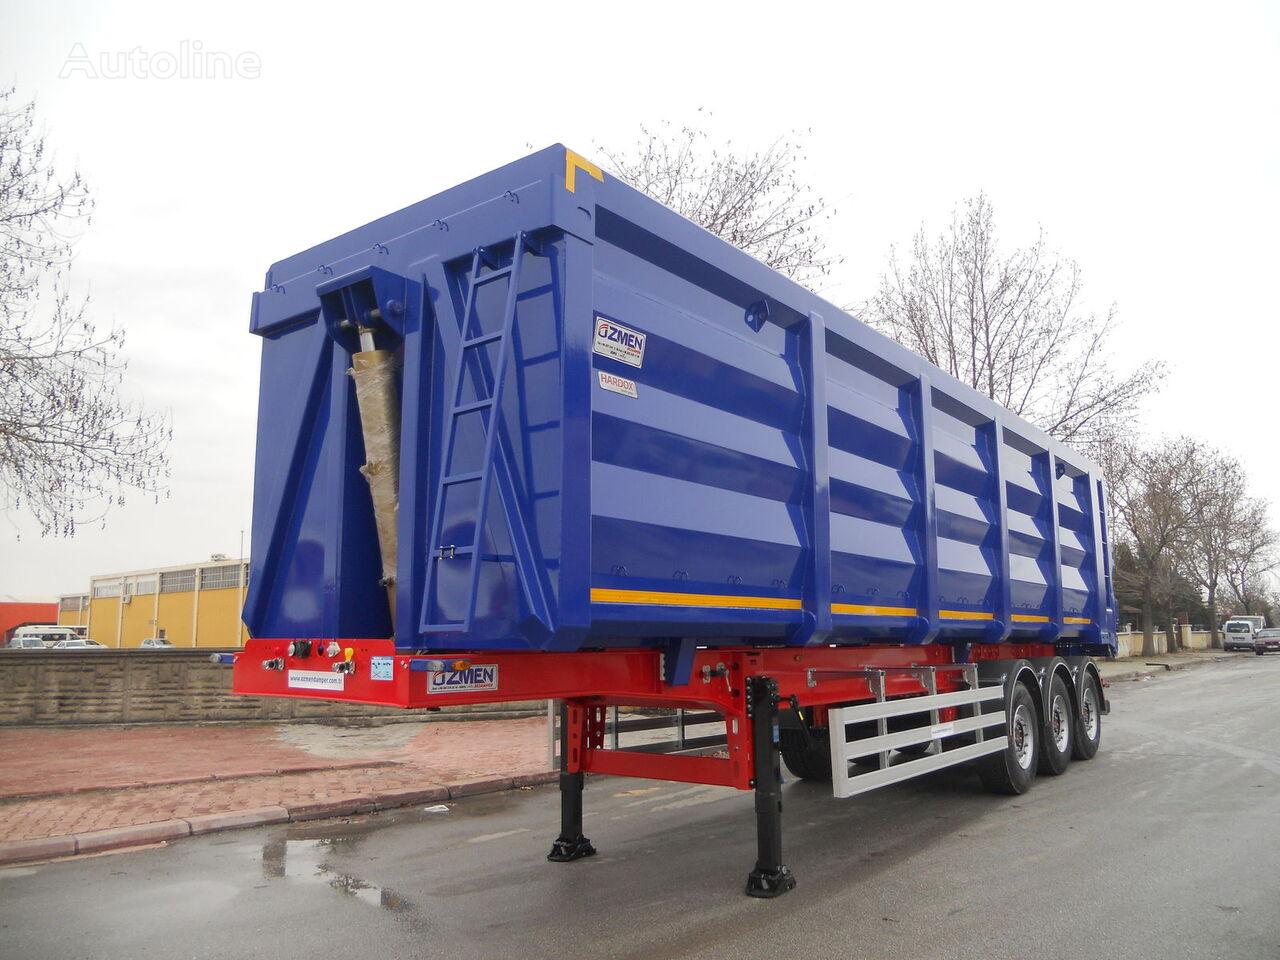 Ozmen Damper 55-60-65-70 m3 H-450 SCRAP METAL CARRIER  semirremolque volquete nuevo